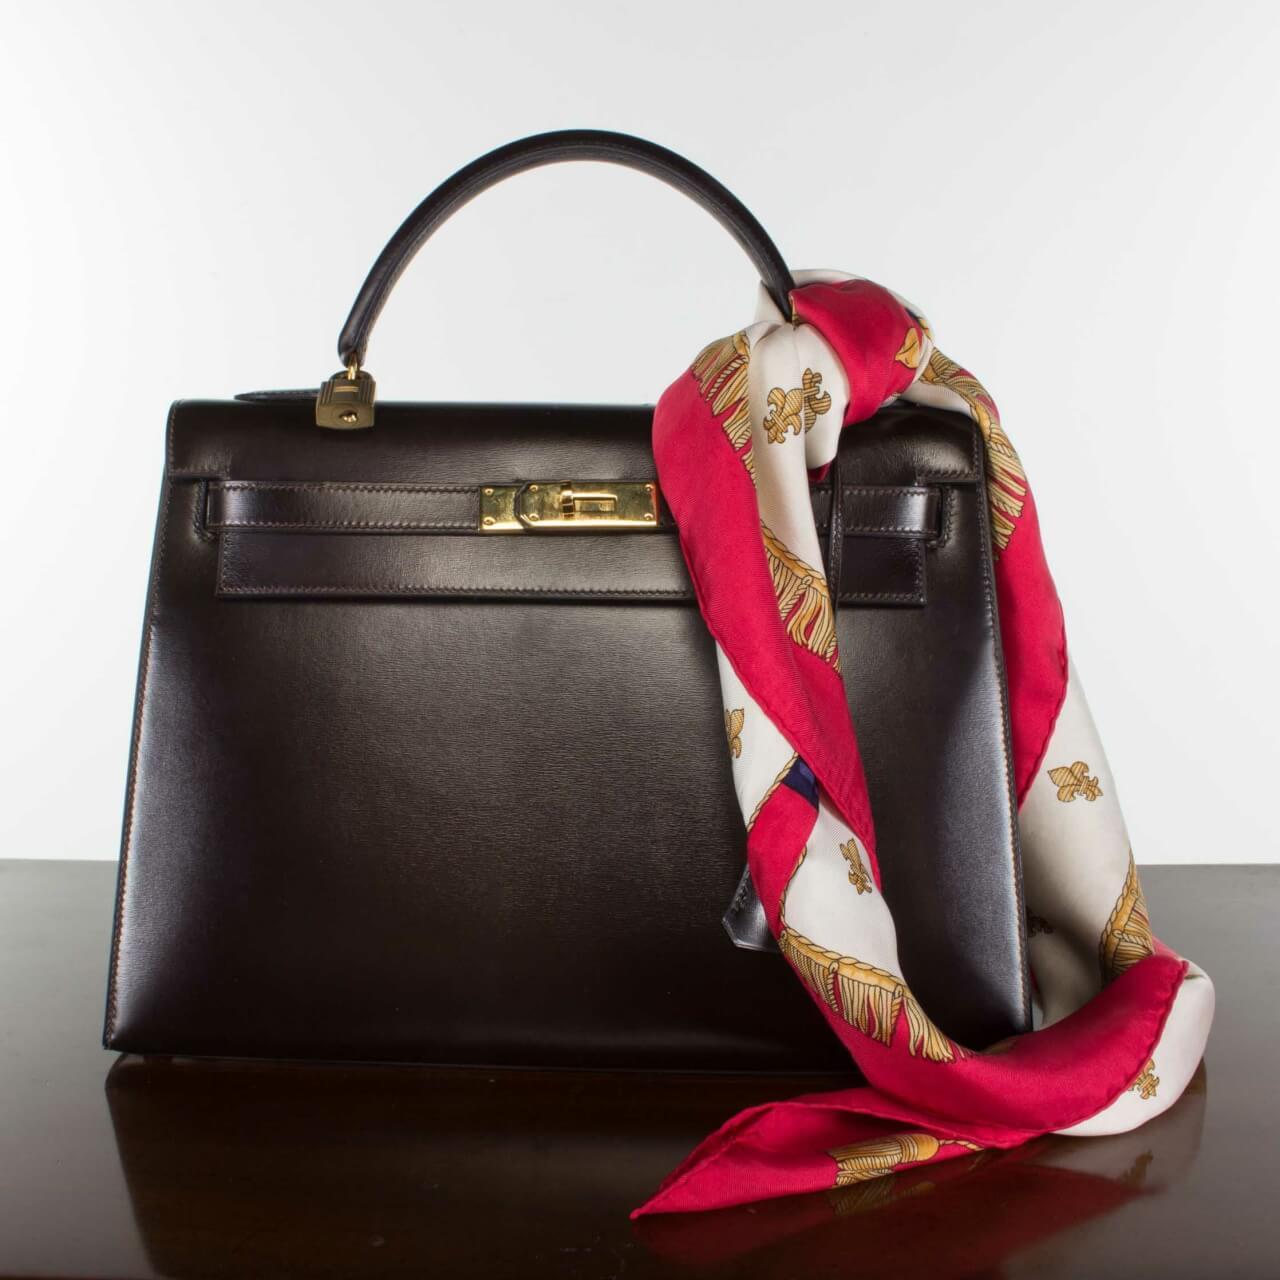 una borsa Hermès - Birkin Bag